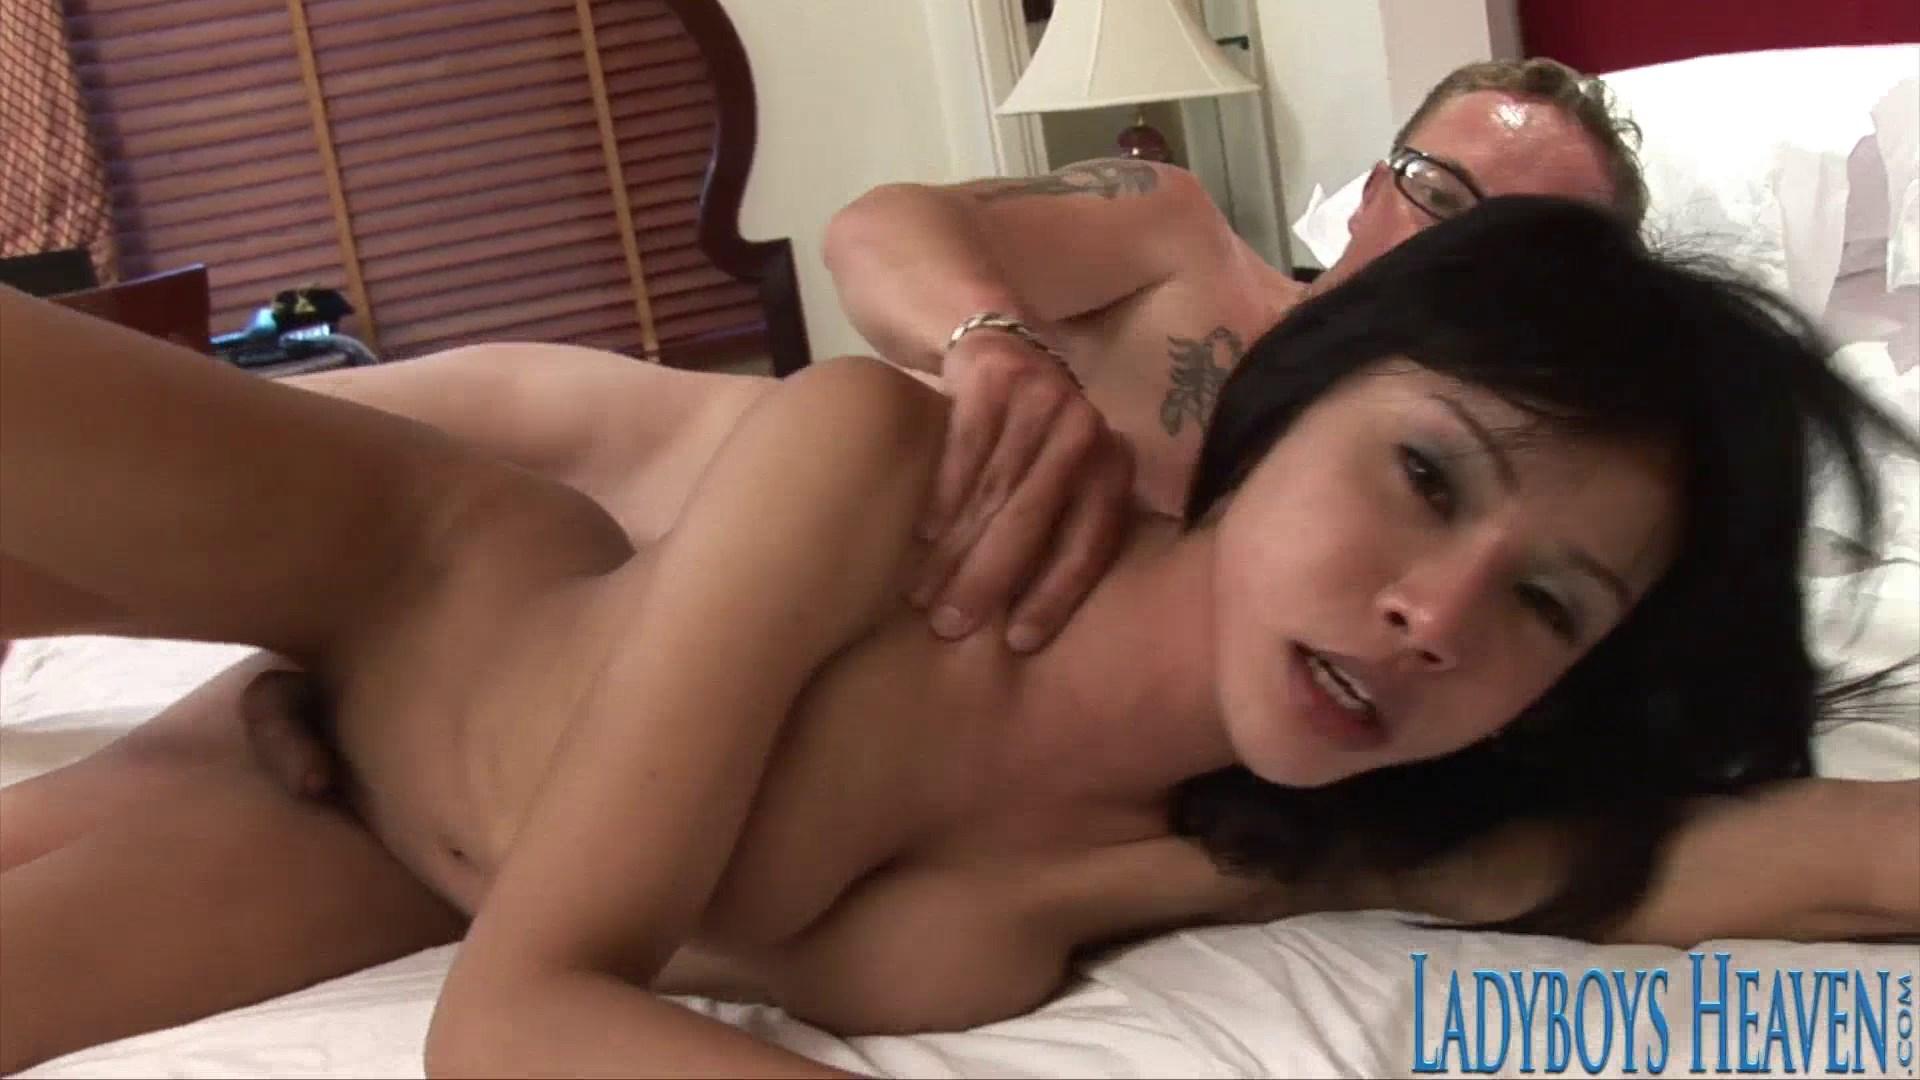 Free ladyboys heaven porn pics